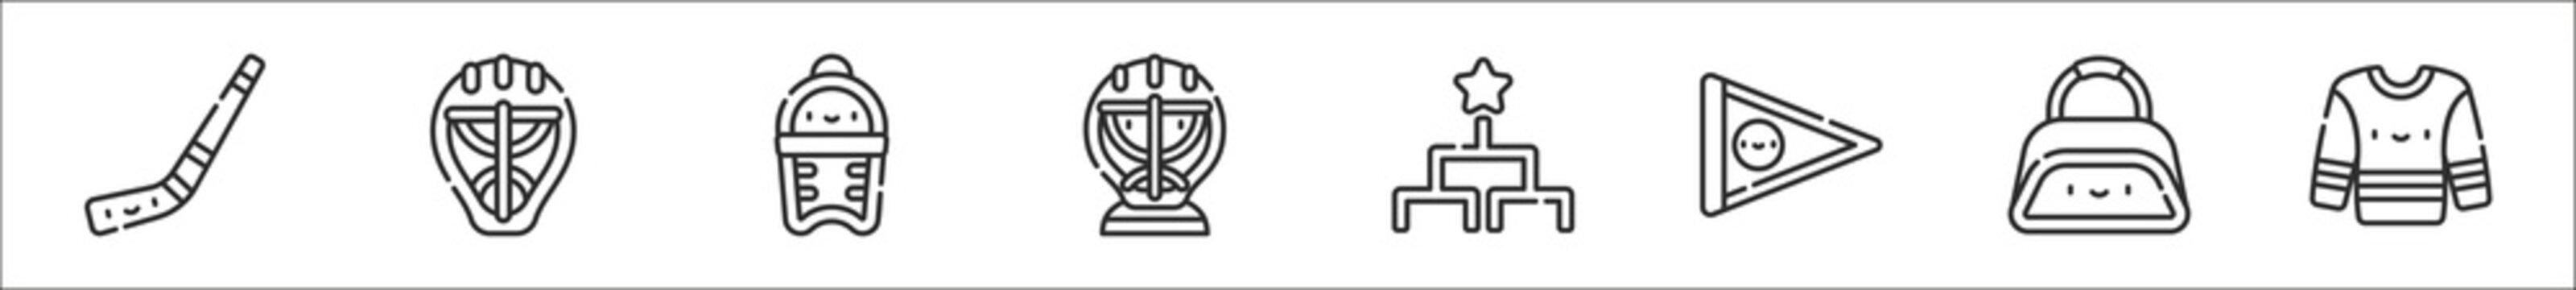 set of 8 hockey thin outline icons such as hockey stick, hockey helmet, shin guards, goalkeeper, tournament, pennant, sport bag, jersey